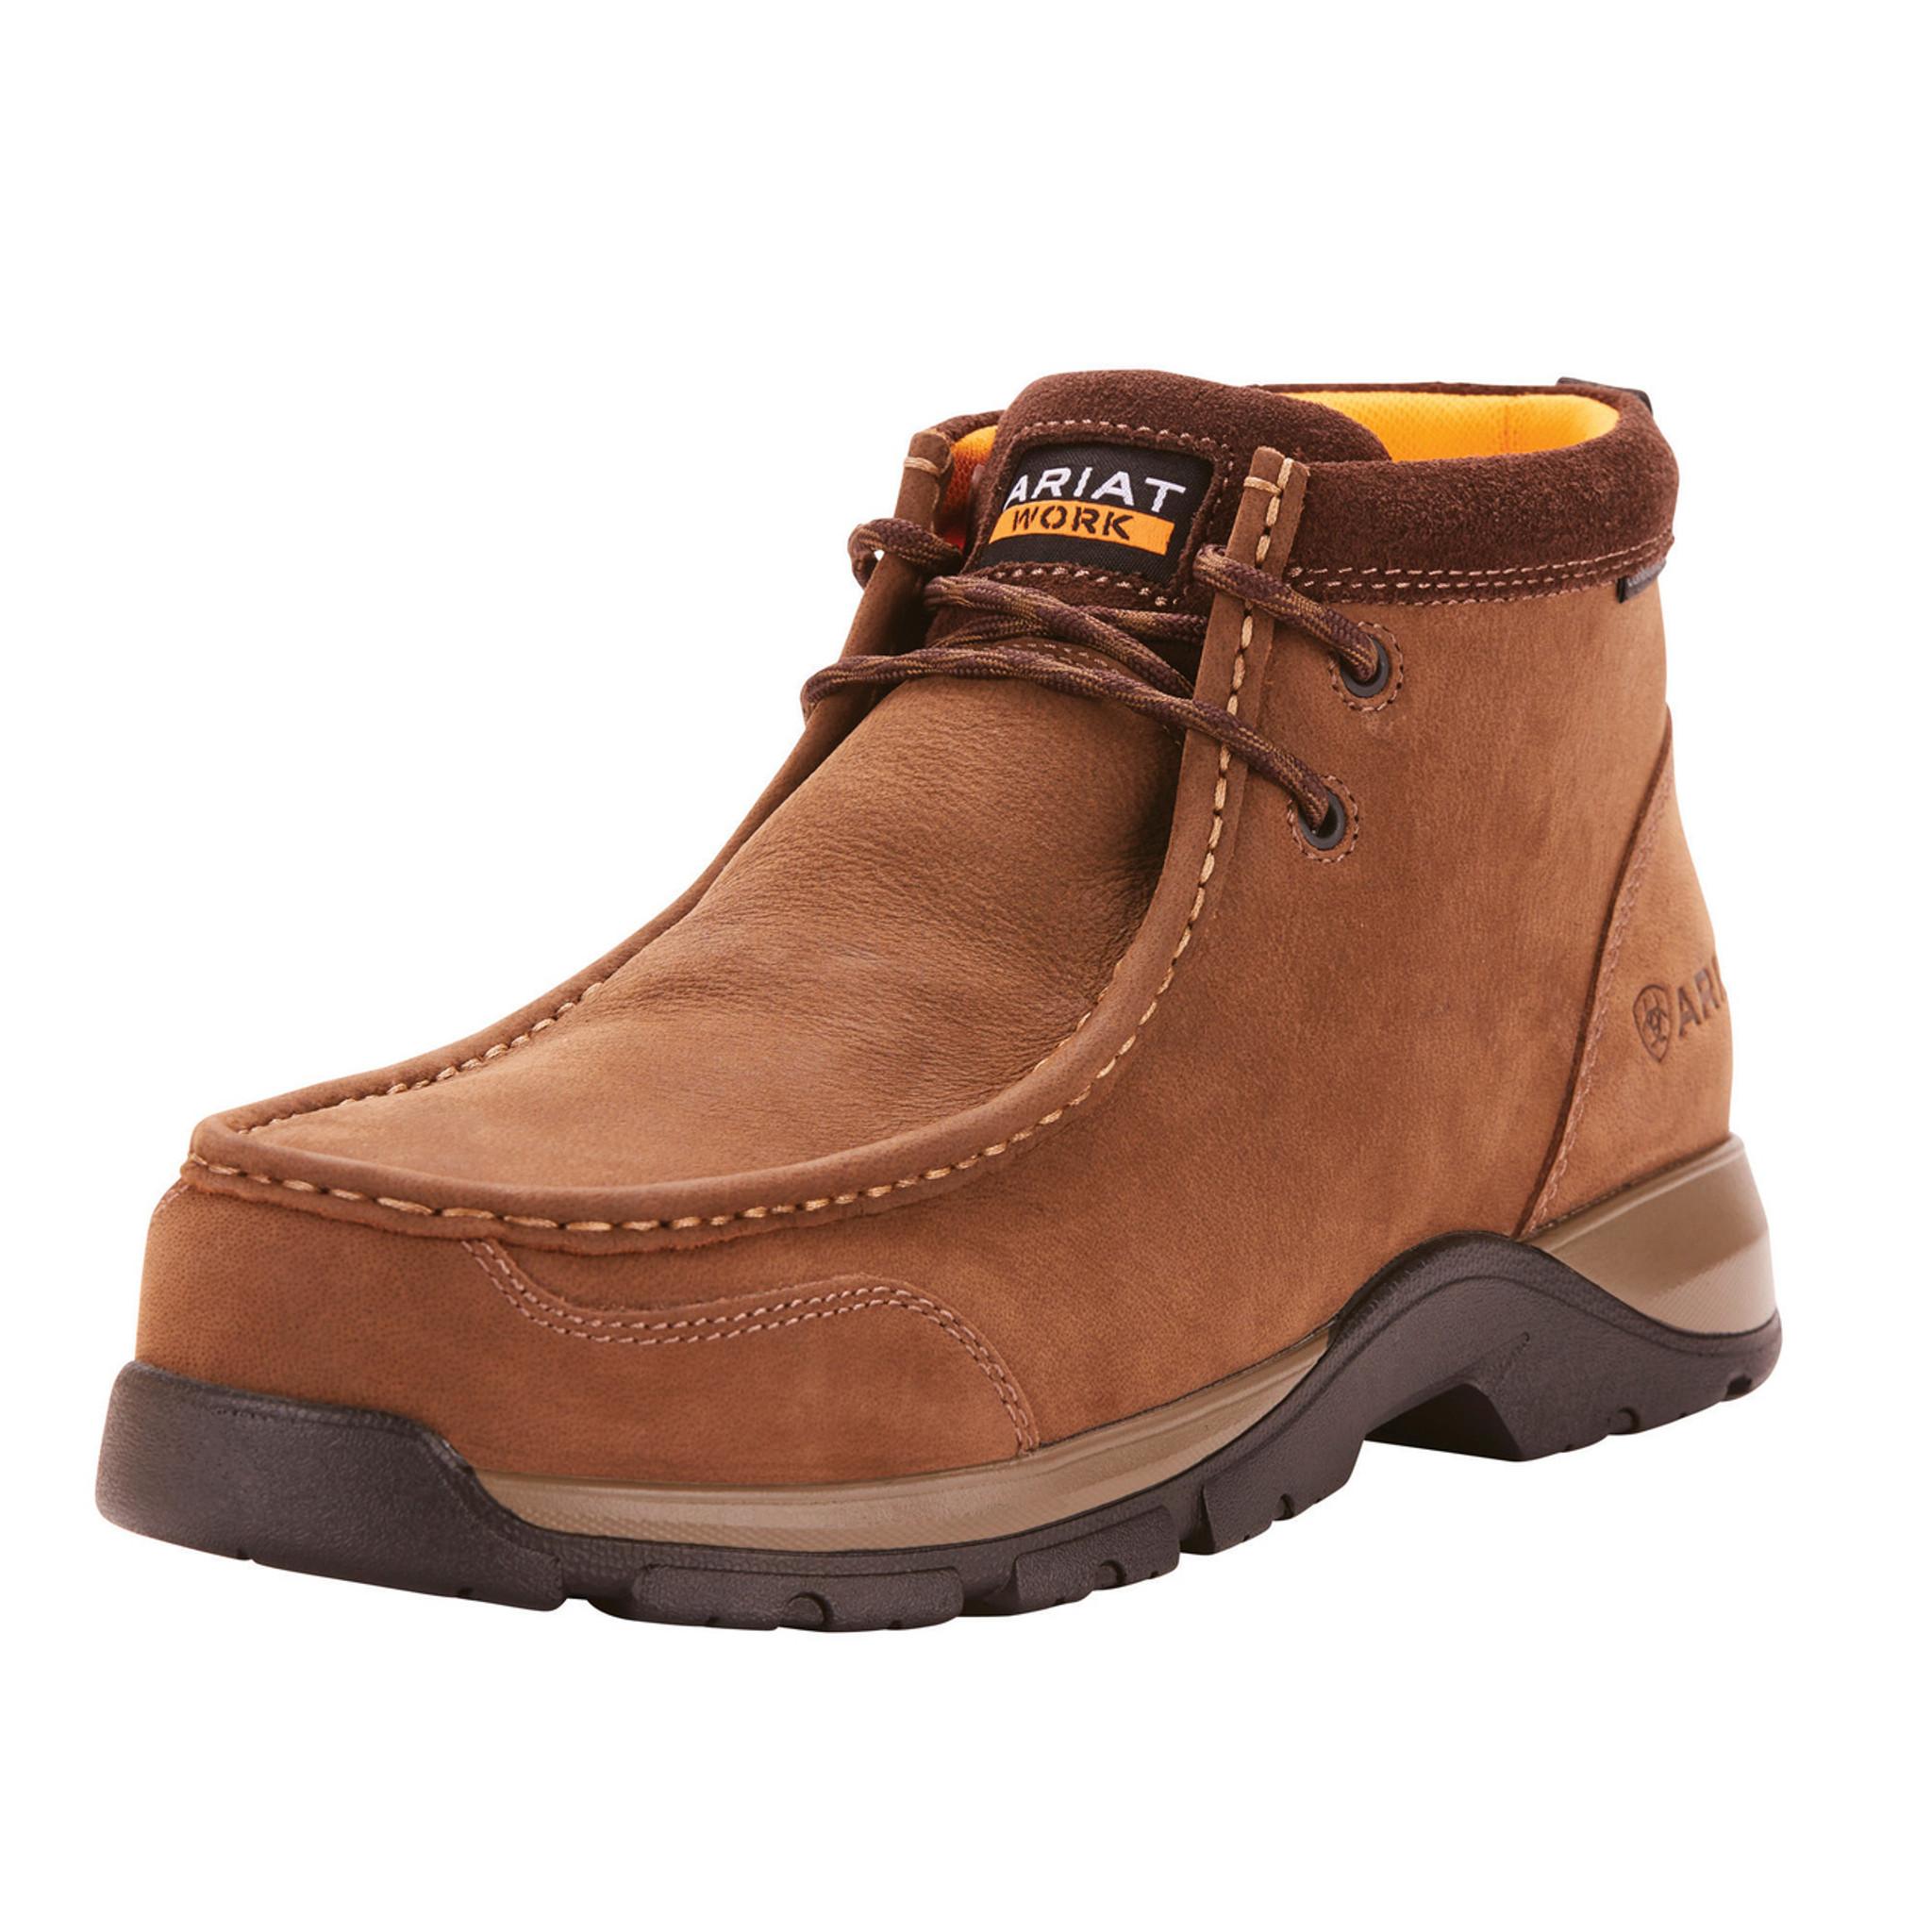 Men's Ariat Boot, Edge LTE, Lace Up